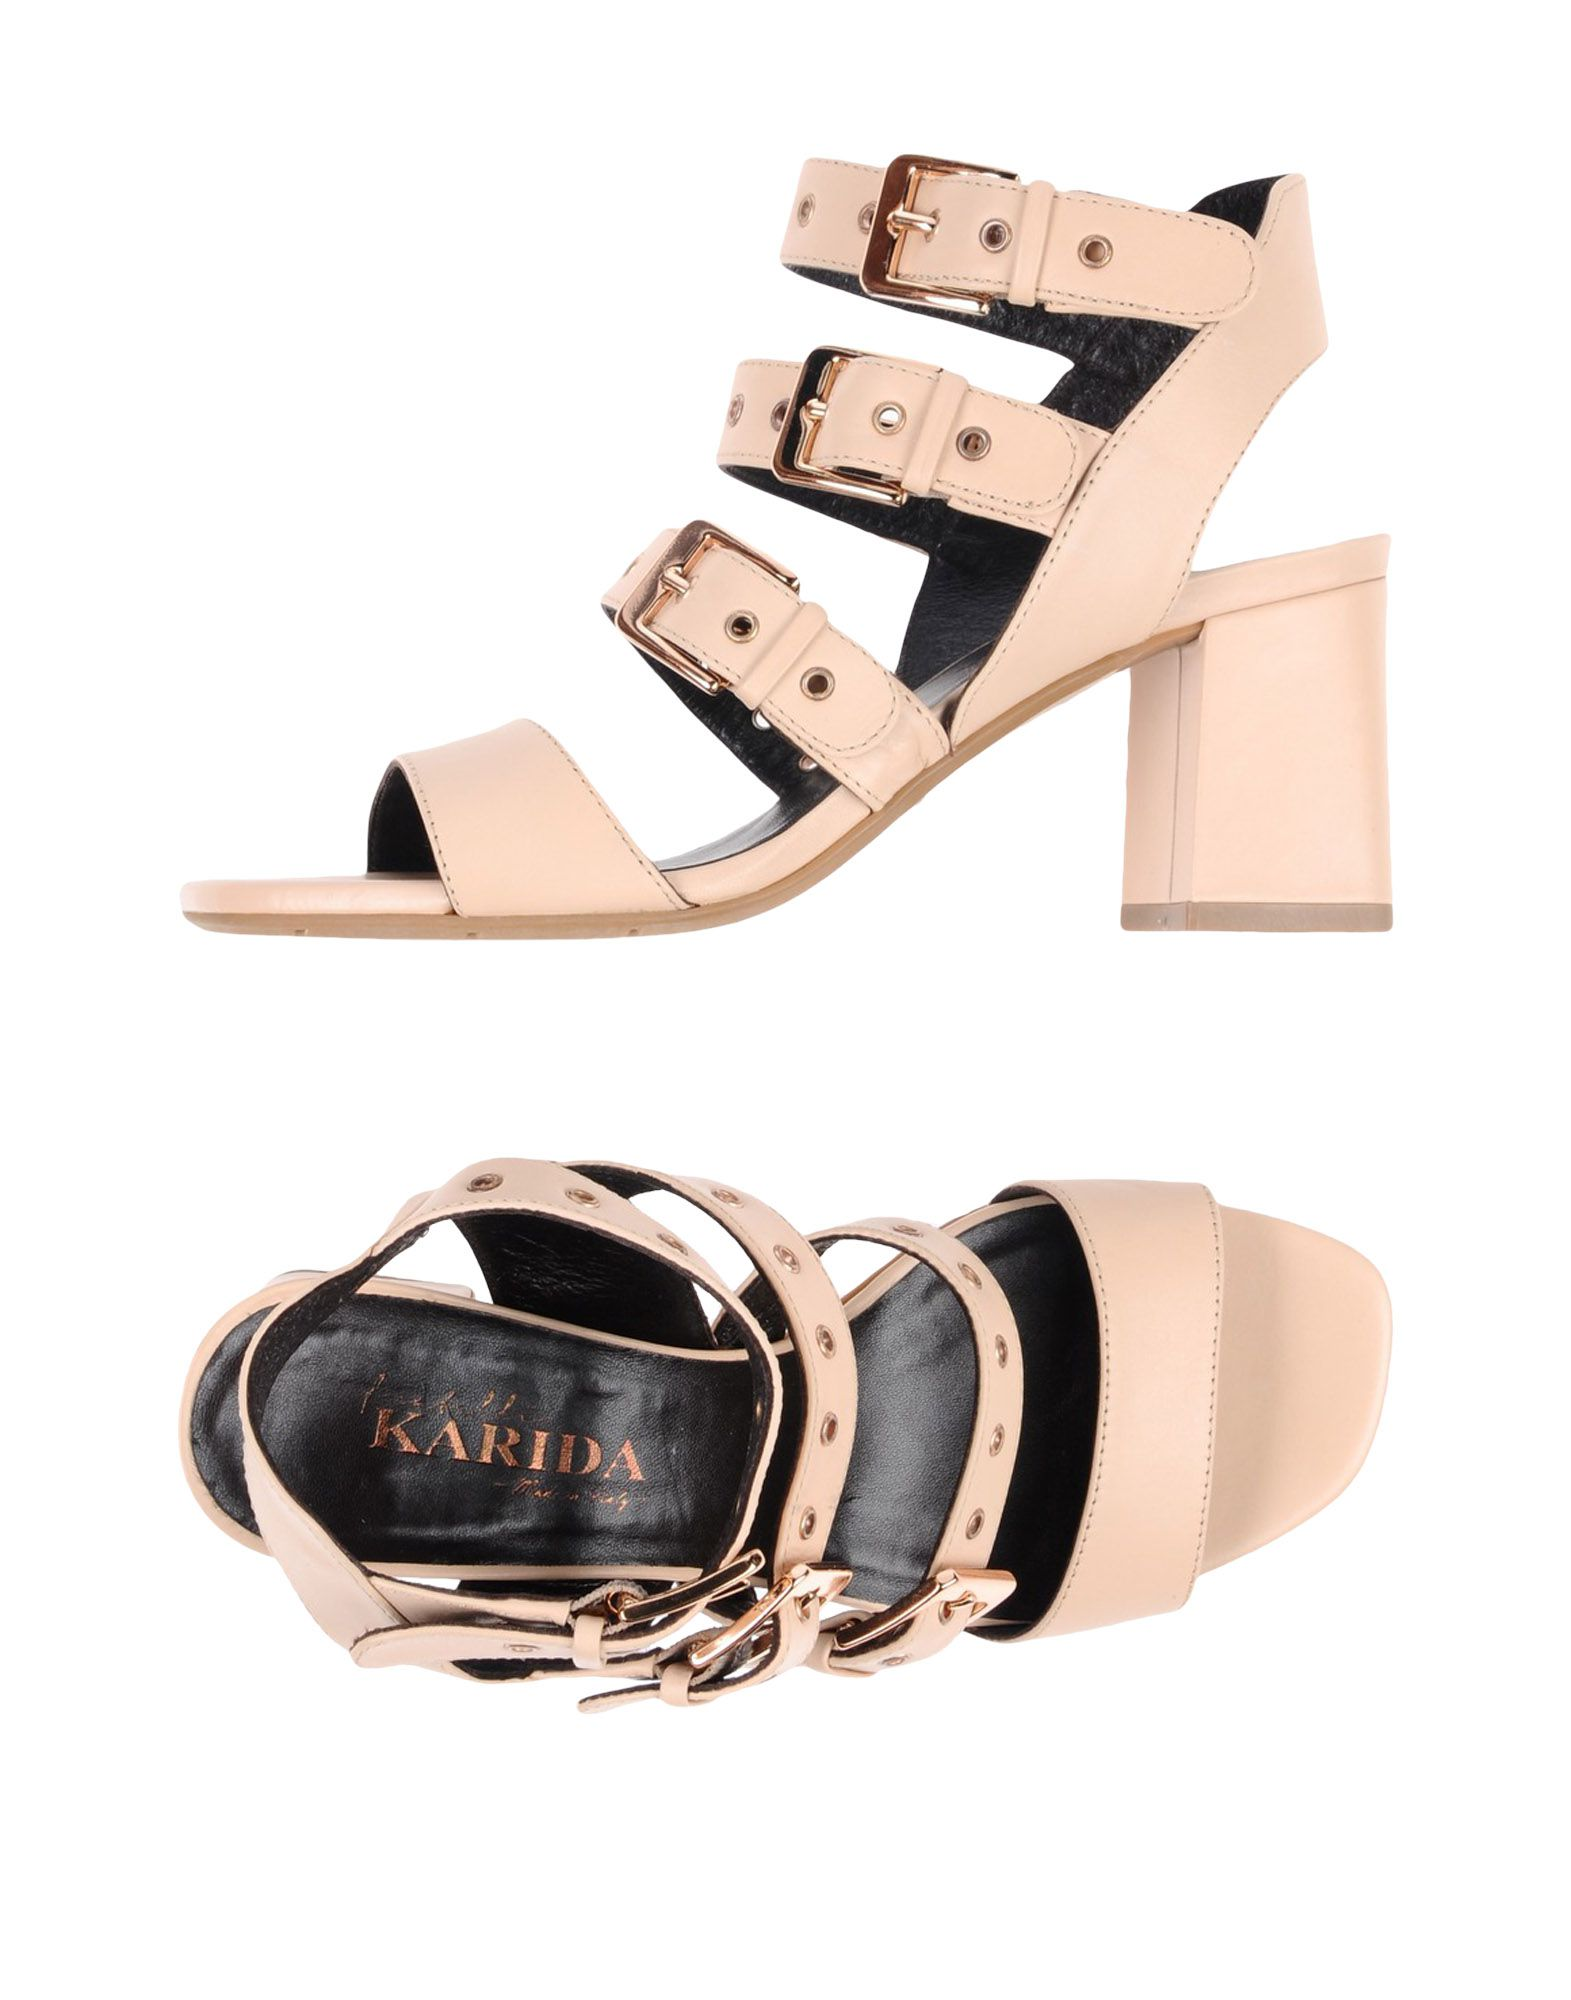 Fratelli Karida Sandalen Sandalen Karida Damen  11399628SG Gute Qualität beliebte Schuhe 74c4d6